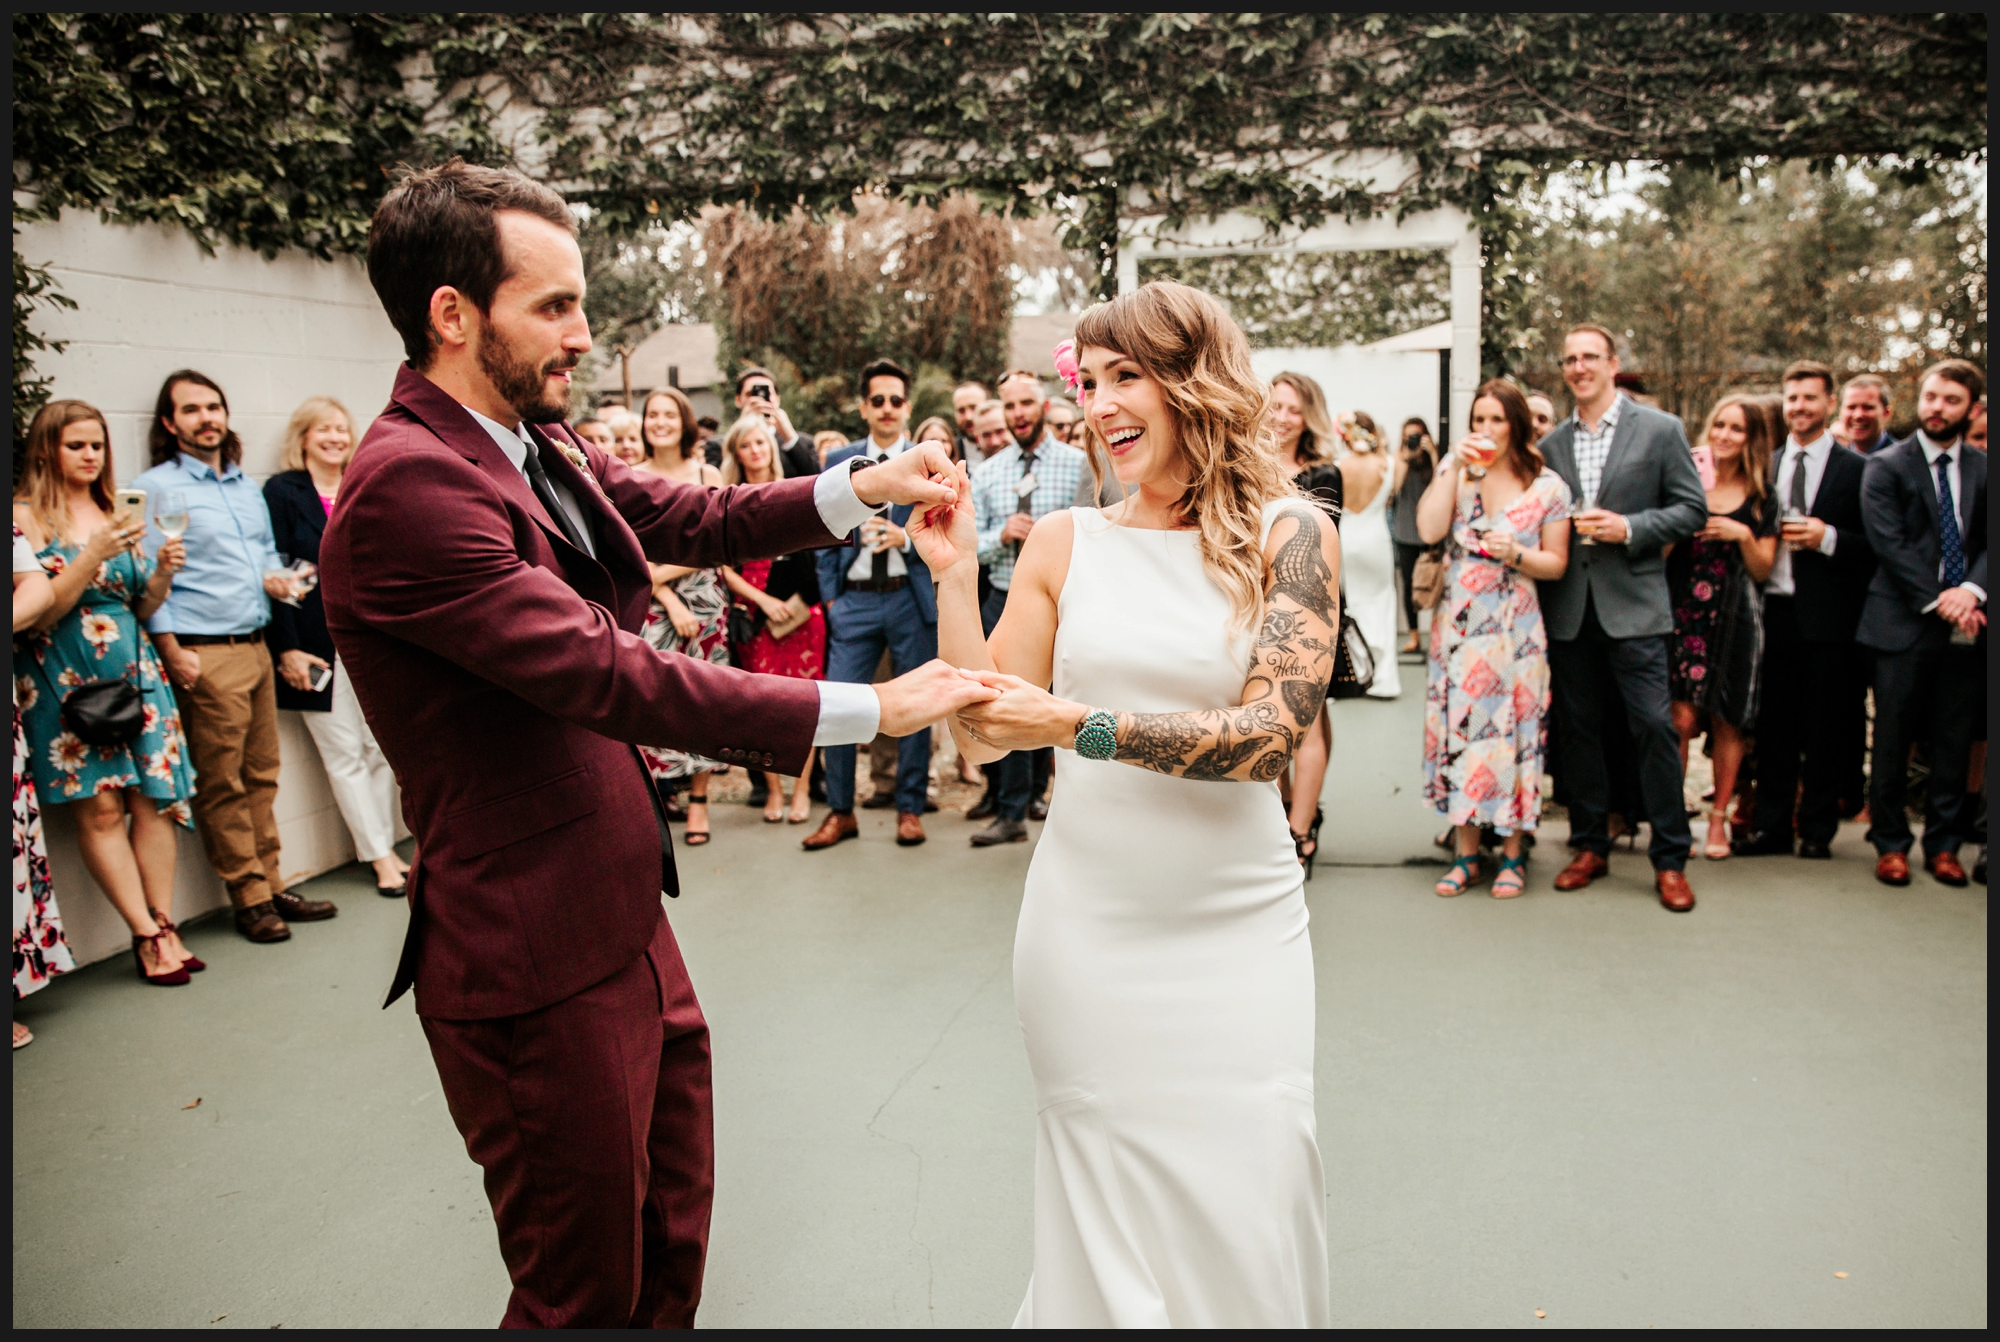 Orlando-Wedding-Photographer-destination-wedding-photographer-florida-wedding-photographer-bohemian-wedding-photographer_2035.jpg